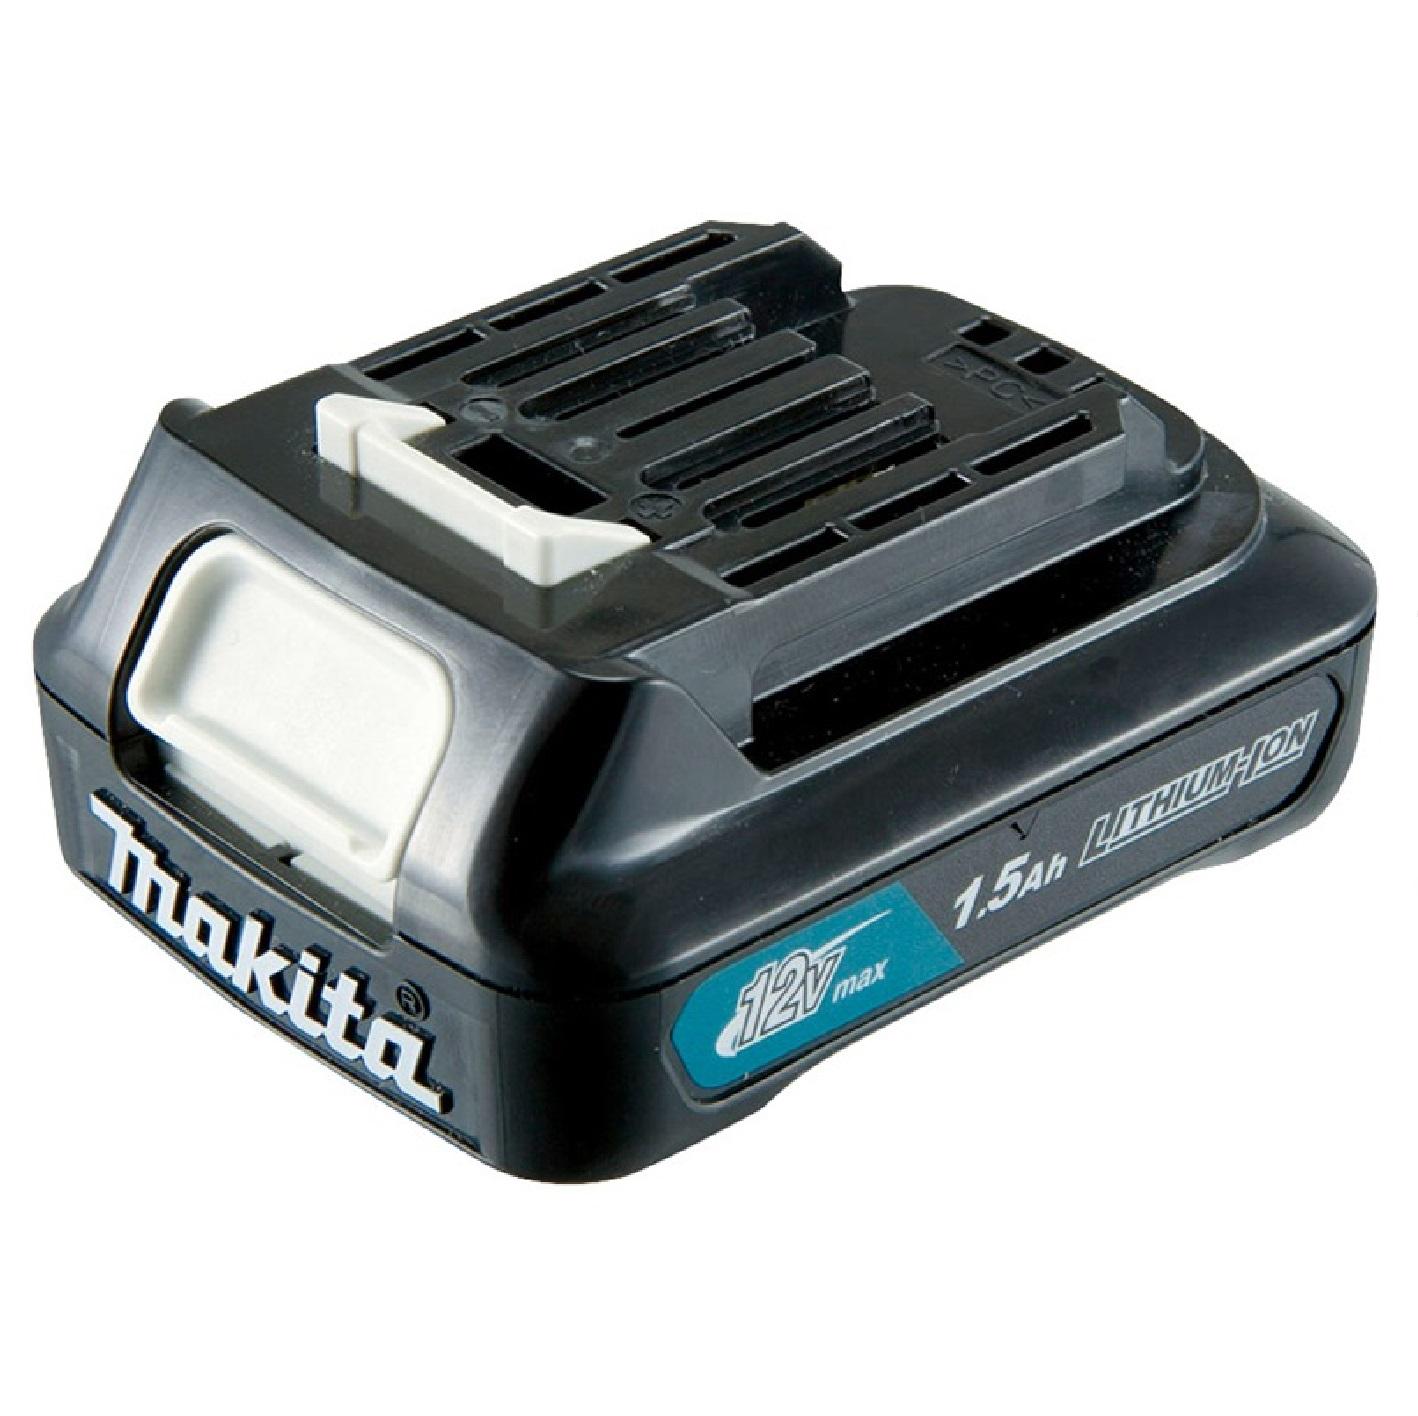 Makita 197393-5 12V 1.5AH LI-ION Battery BL1016